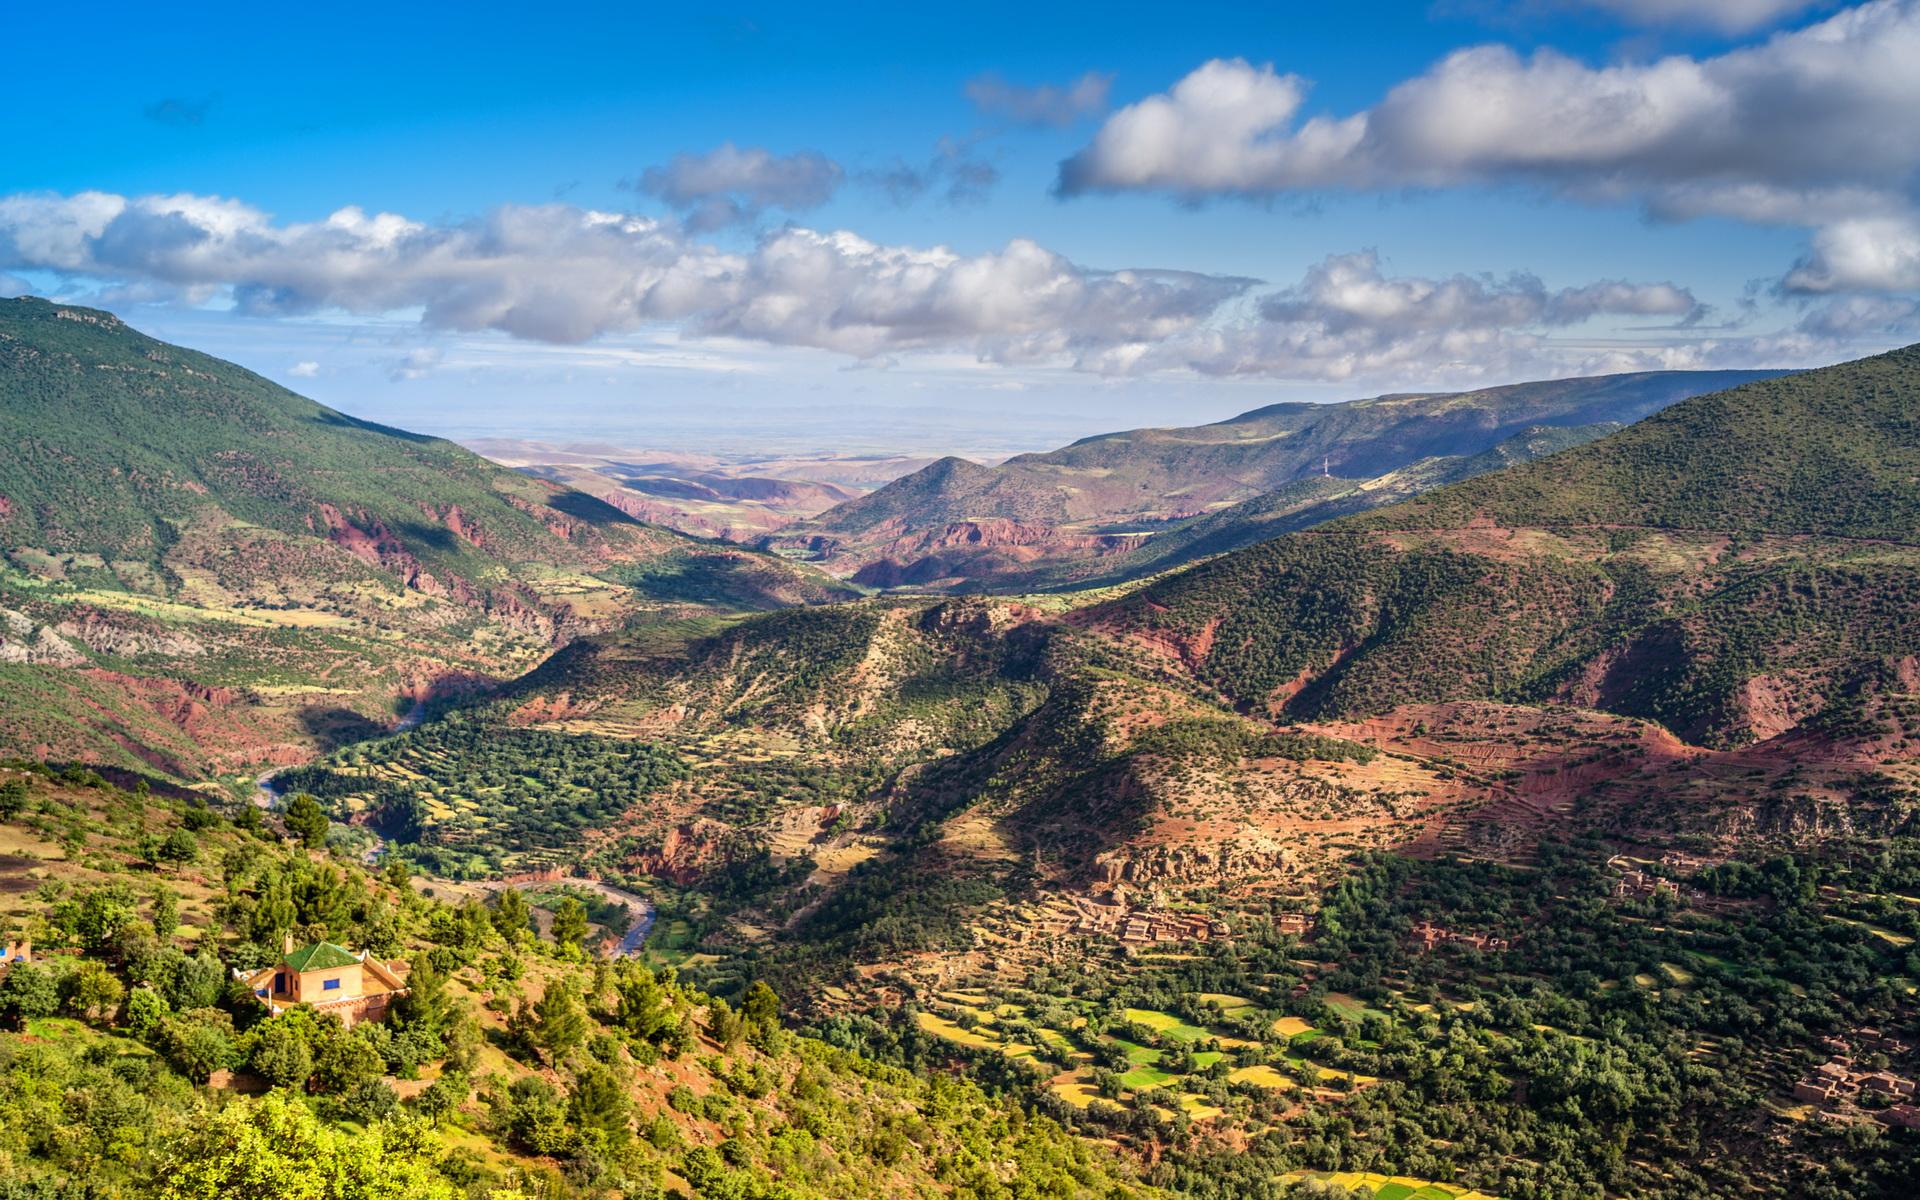 Active Treks Morocco - Ourika to Imlil trek